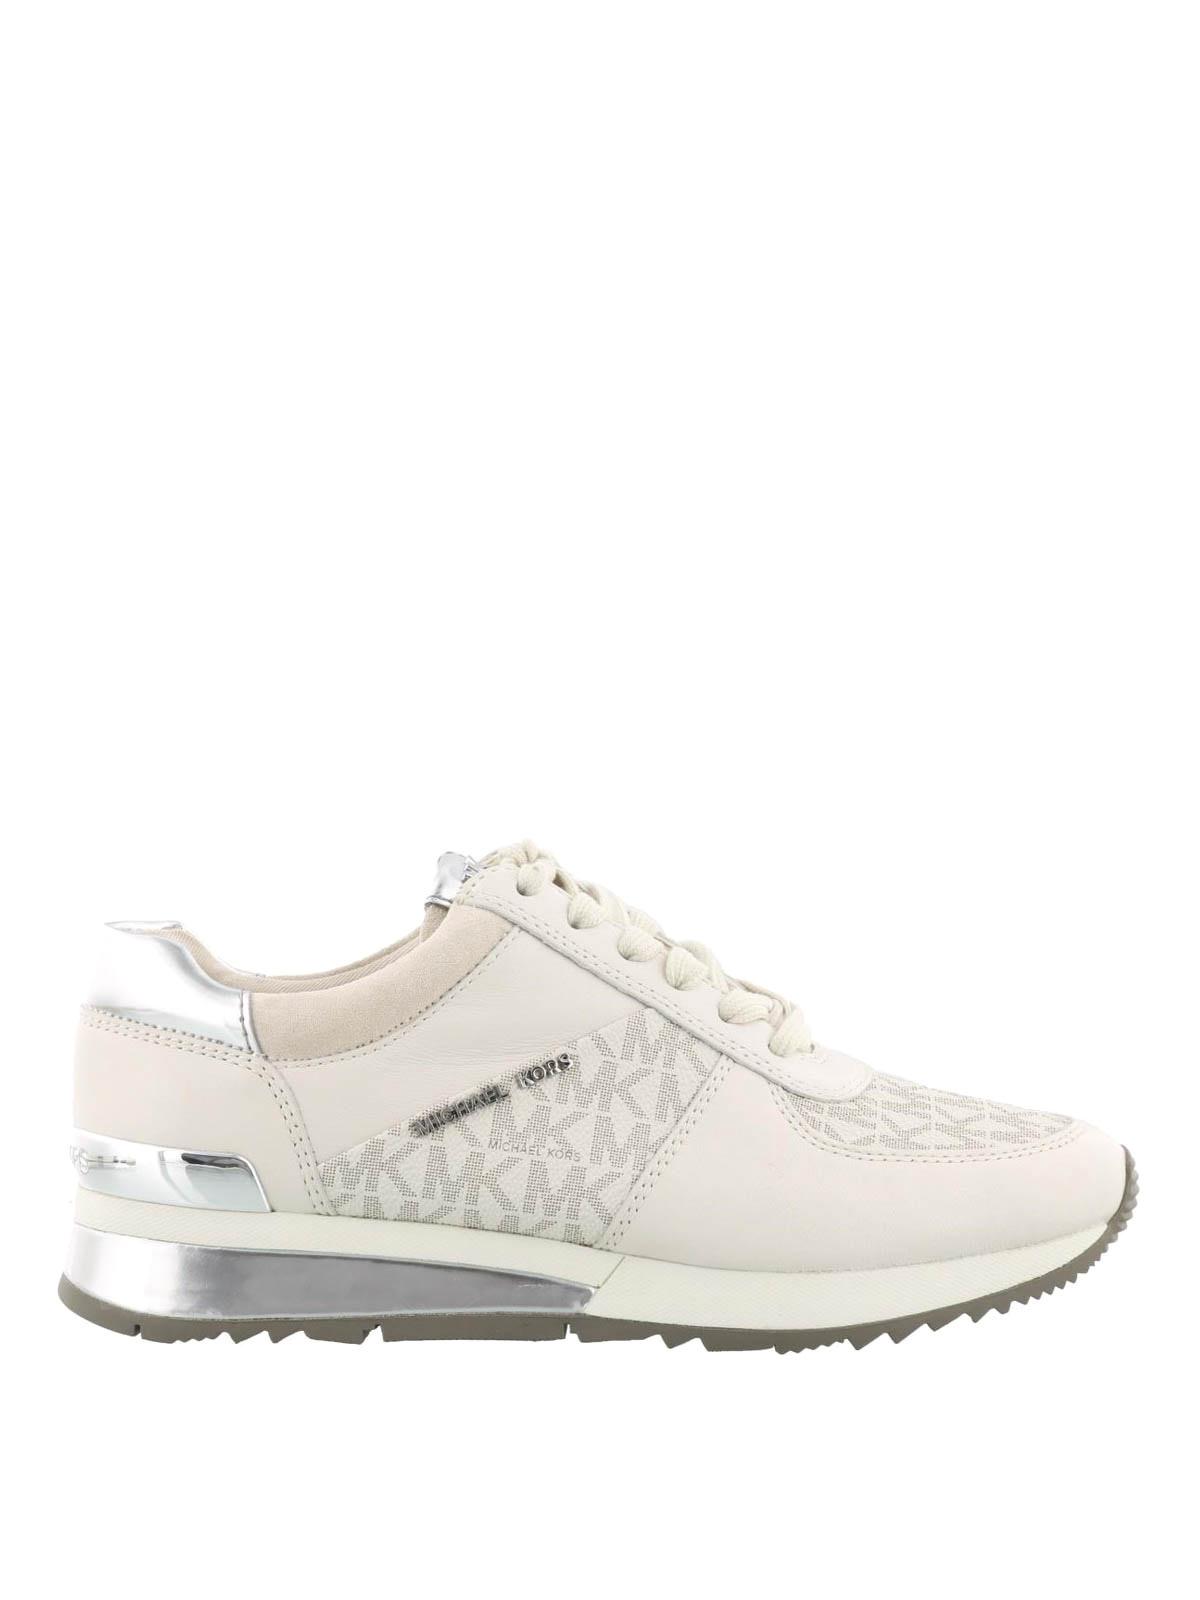 8838d993 Michael Kors - Allie sneakers - trainers - 43R6ALFP2B150 | iKRIX.com